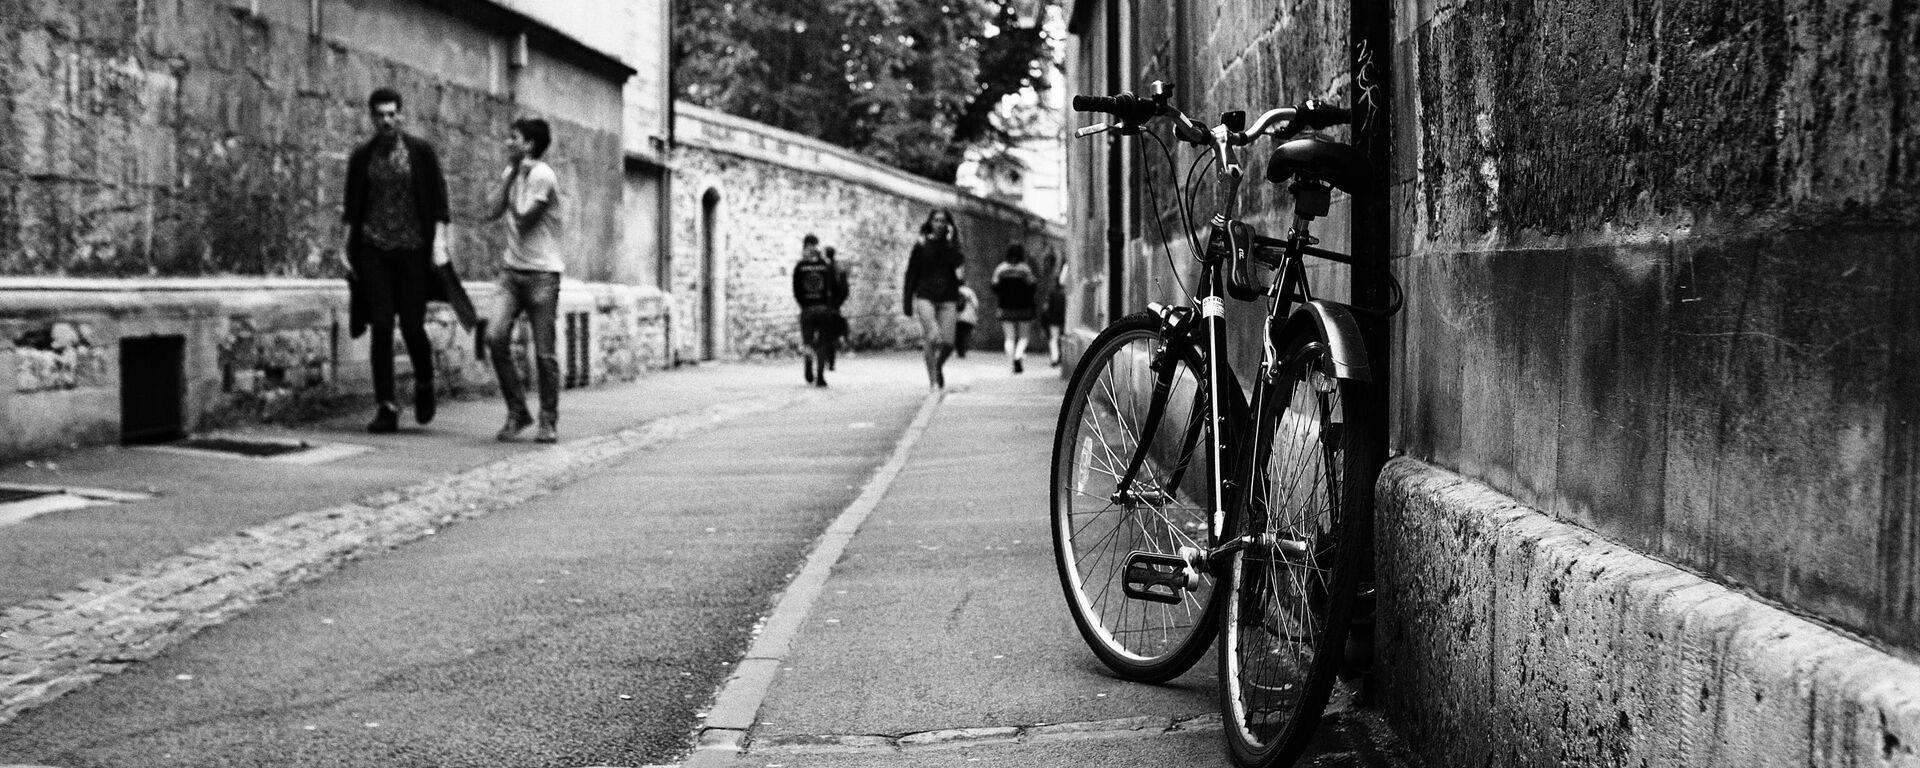 Bicicleta  - Sputnik Mundo, 1920, 21.02.2021